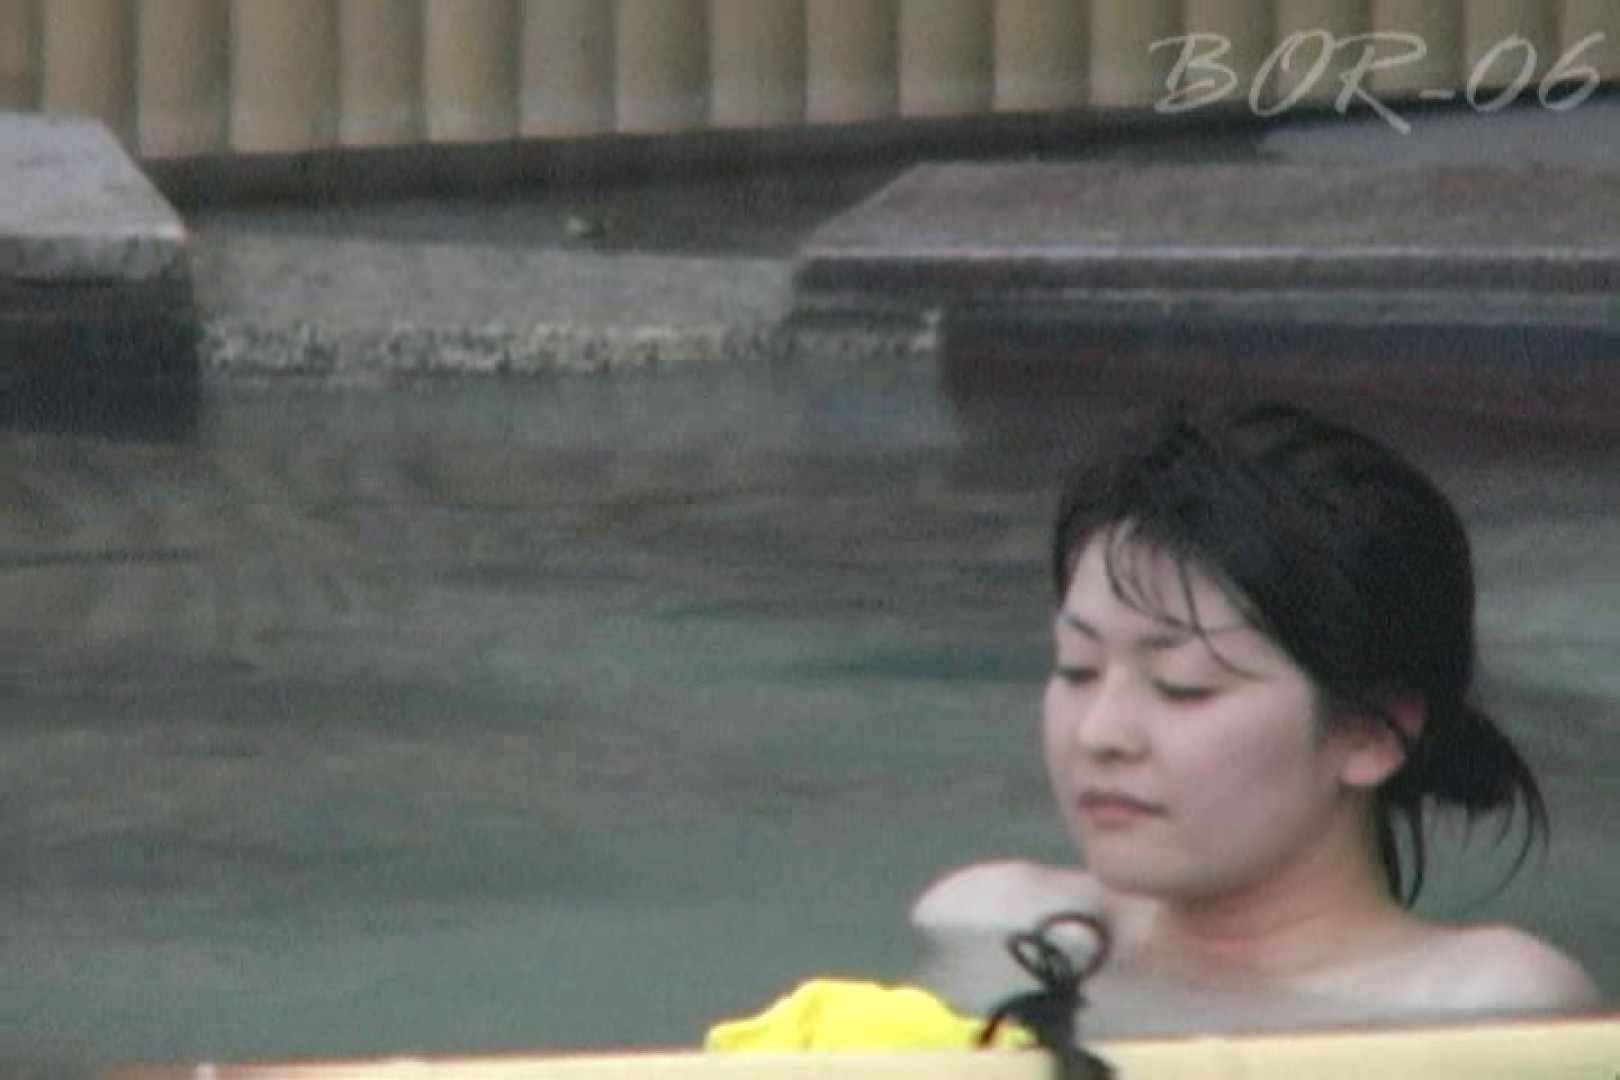 Aquaな露天風呂Vol.523 露天風呂編  98PIX 84